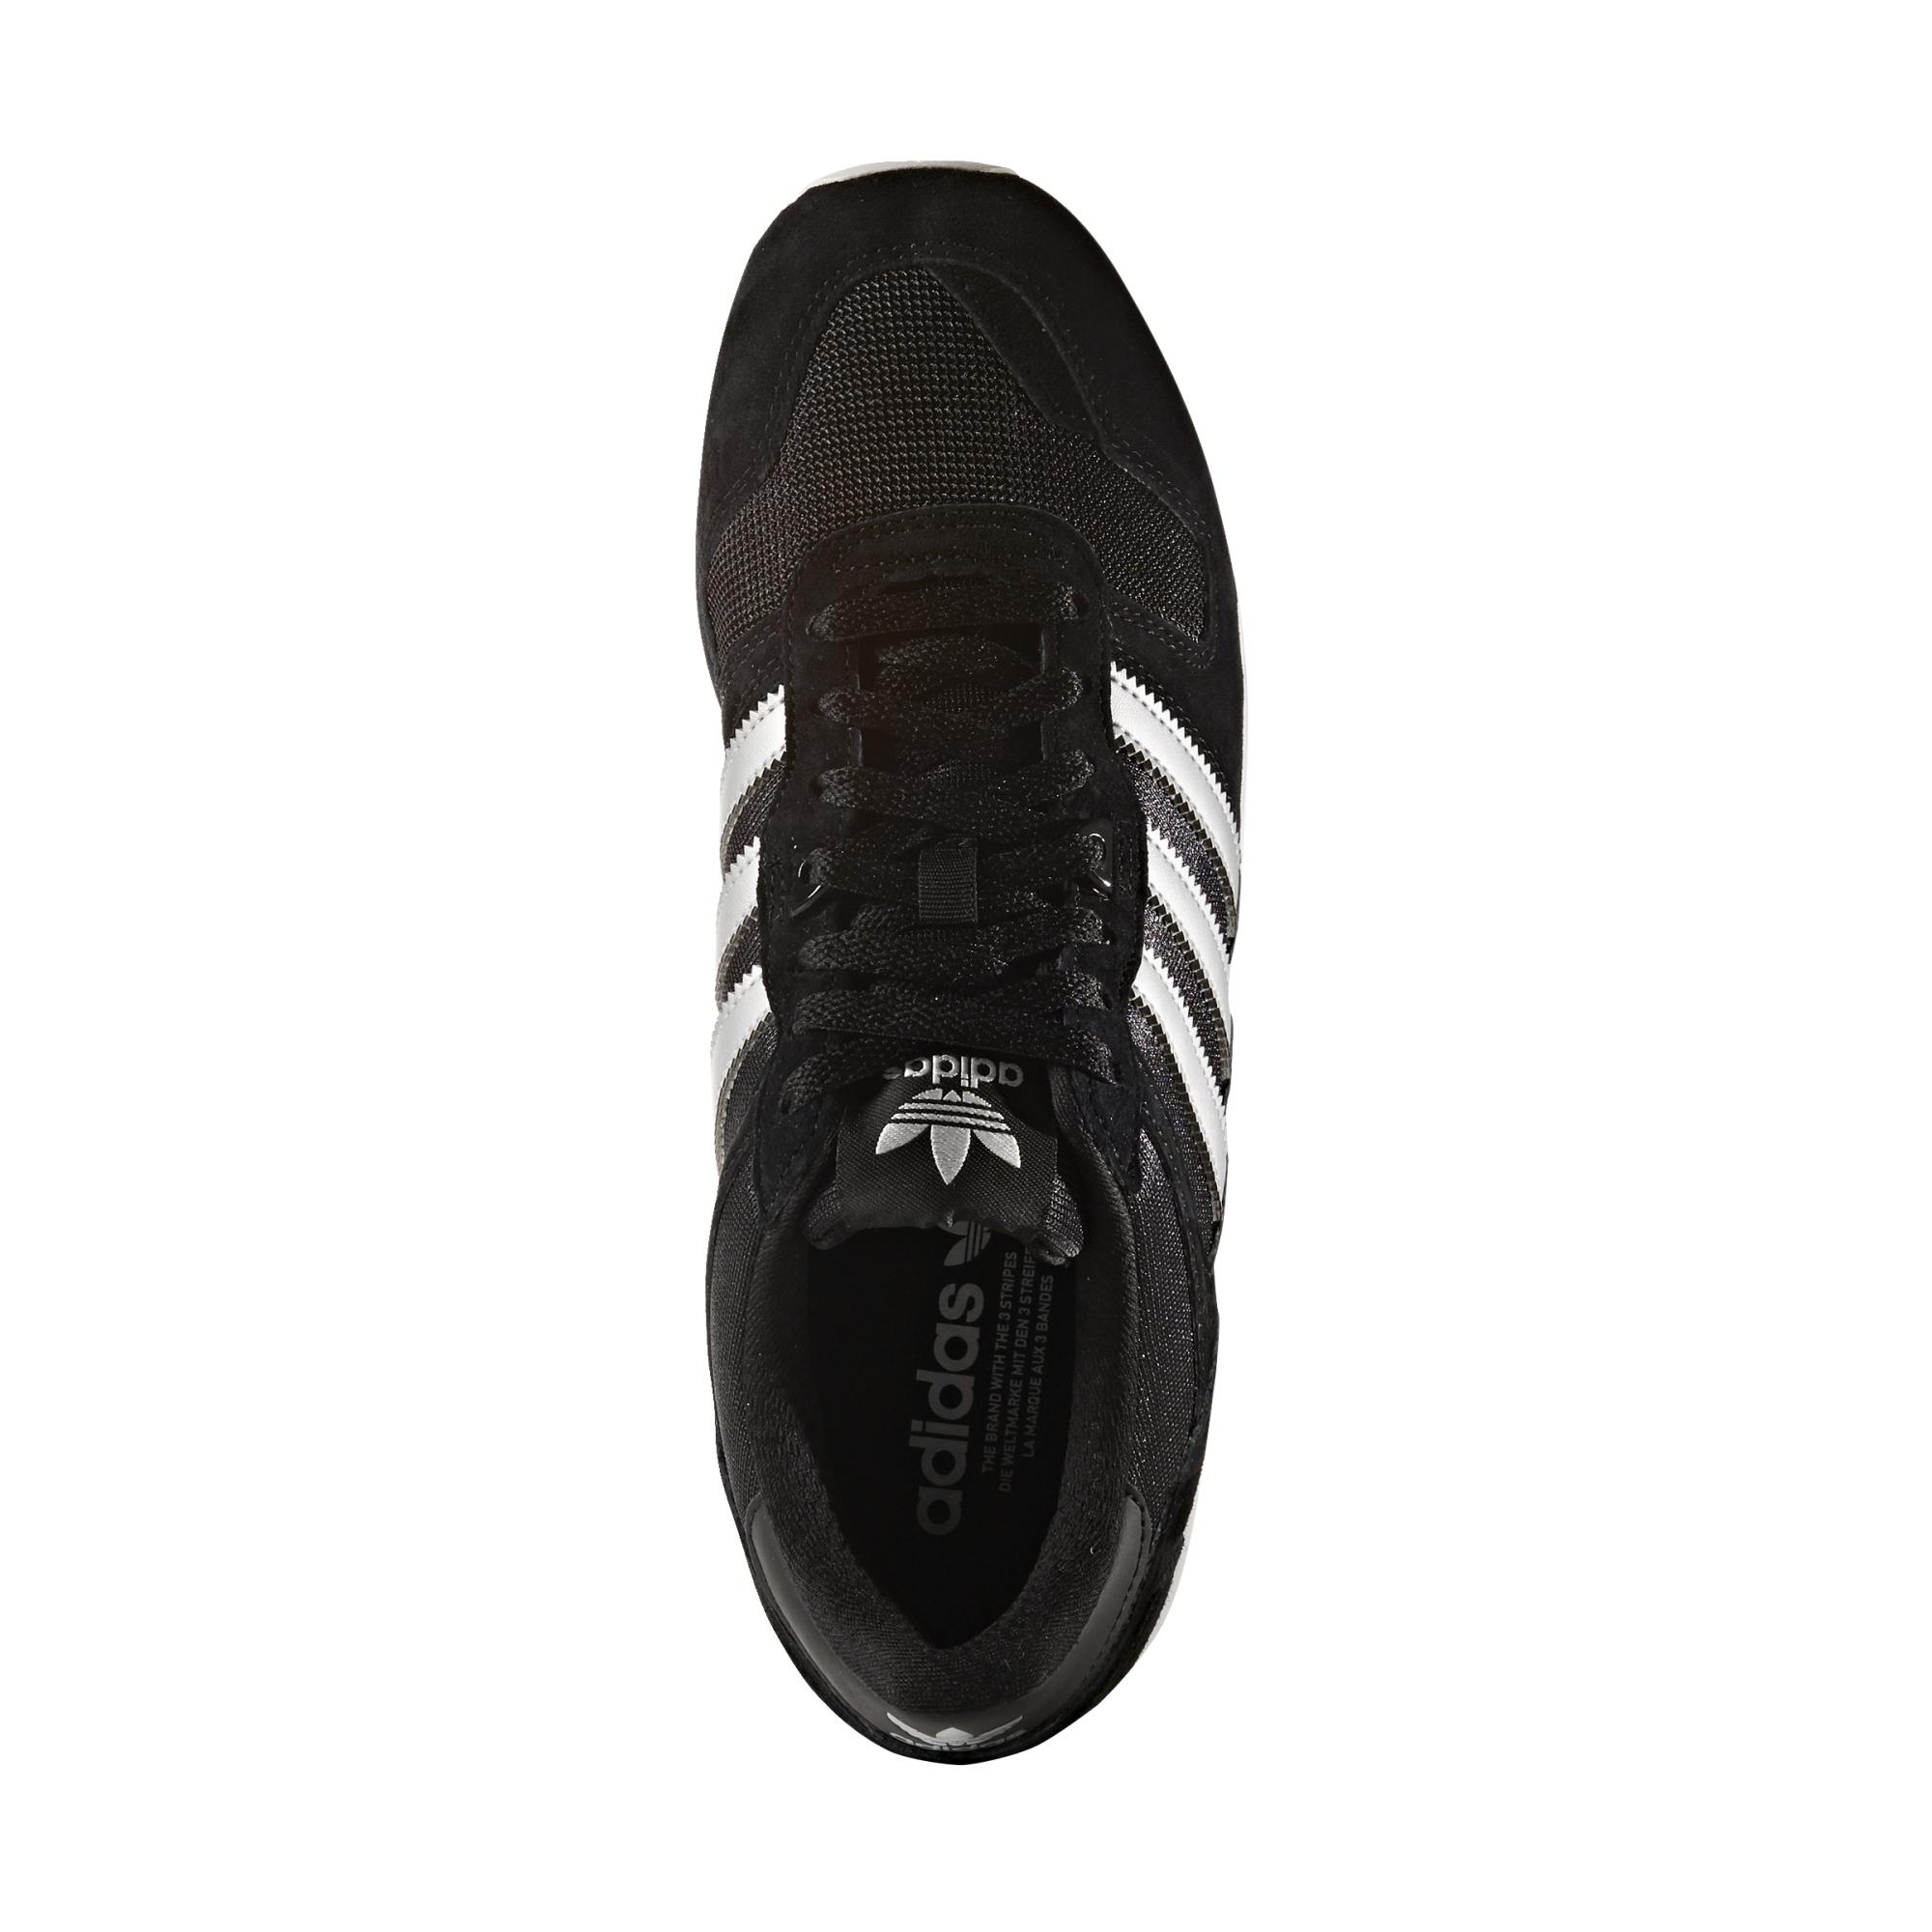 26057fe8f ... italy adidas originals zx 700 essence core black matte silver utility  black 0f3c0 b4228